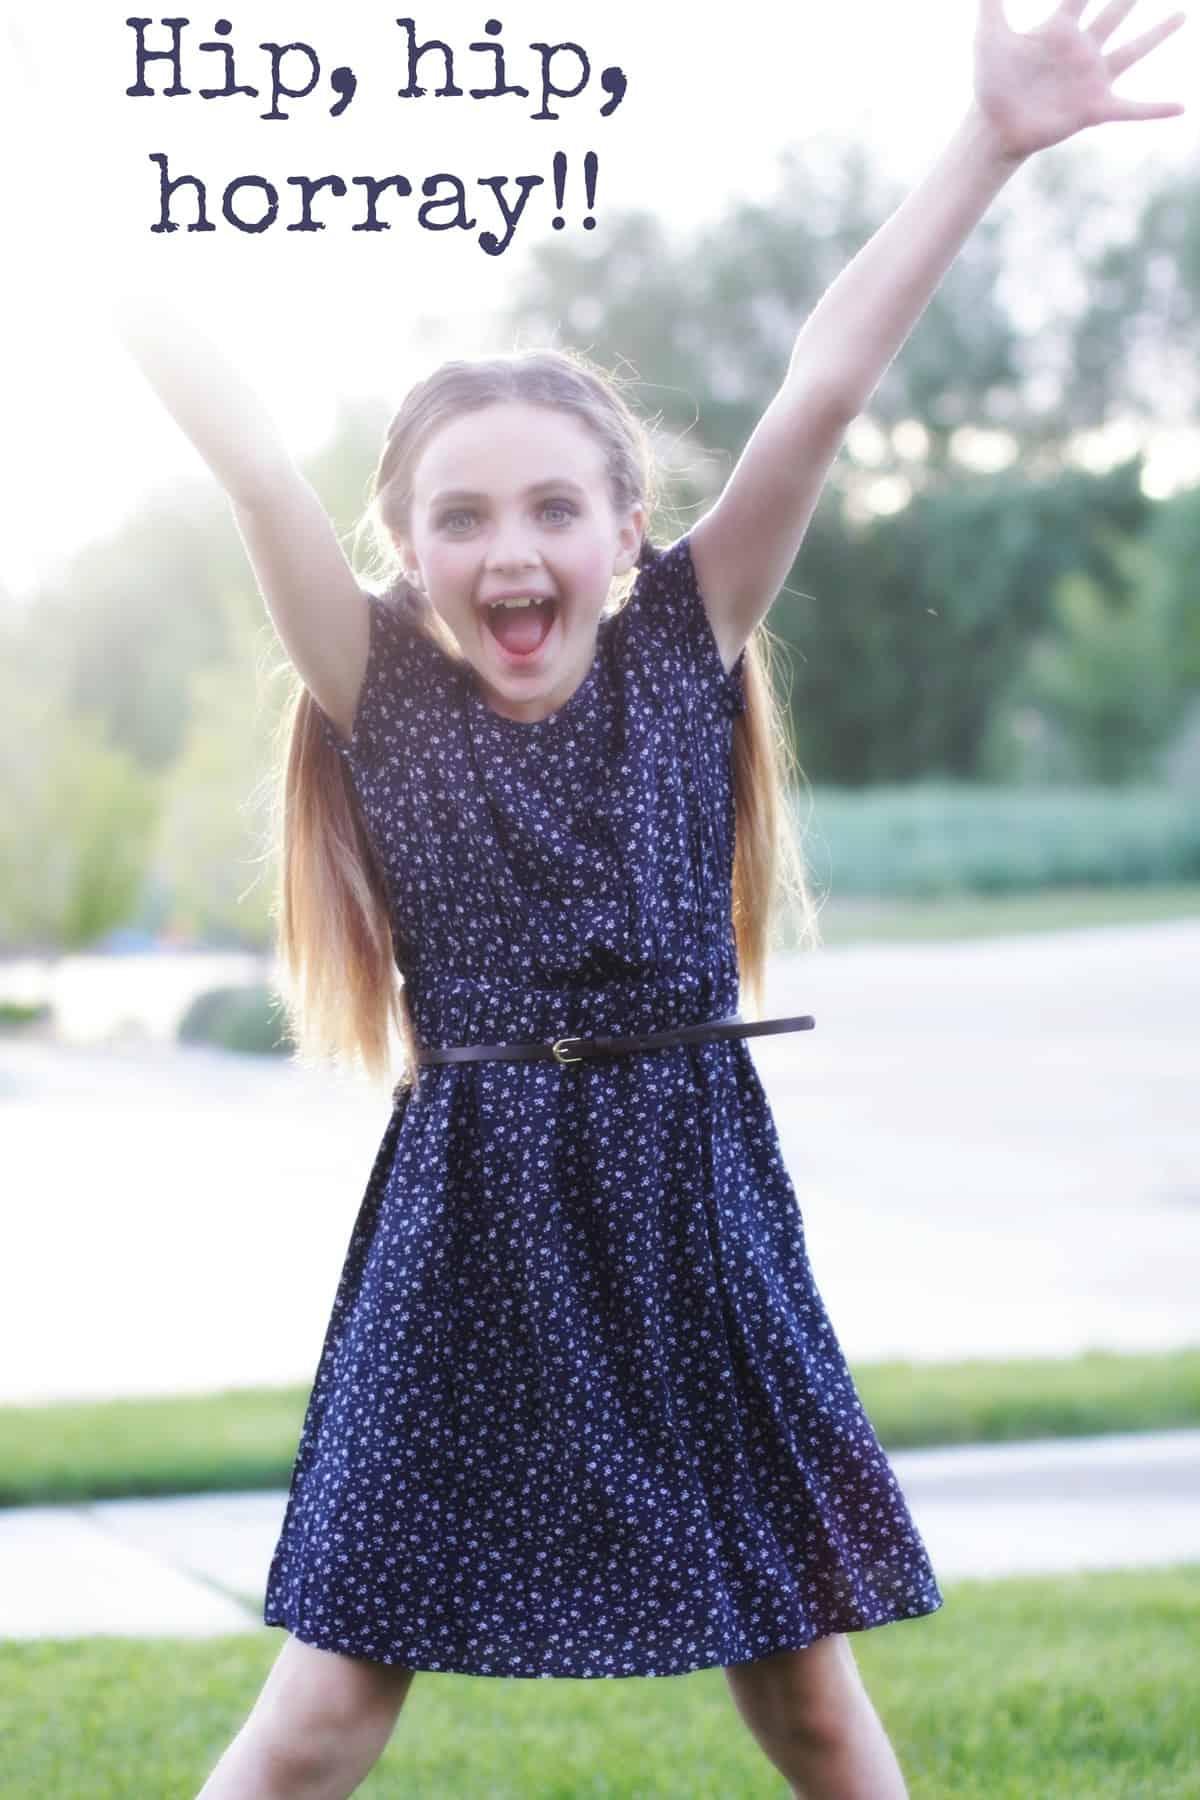 Girls dresses check them out online at mikarose modest girls dresses